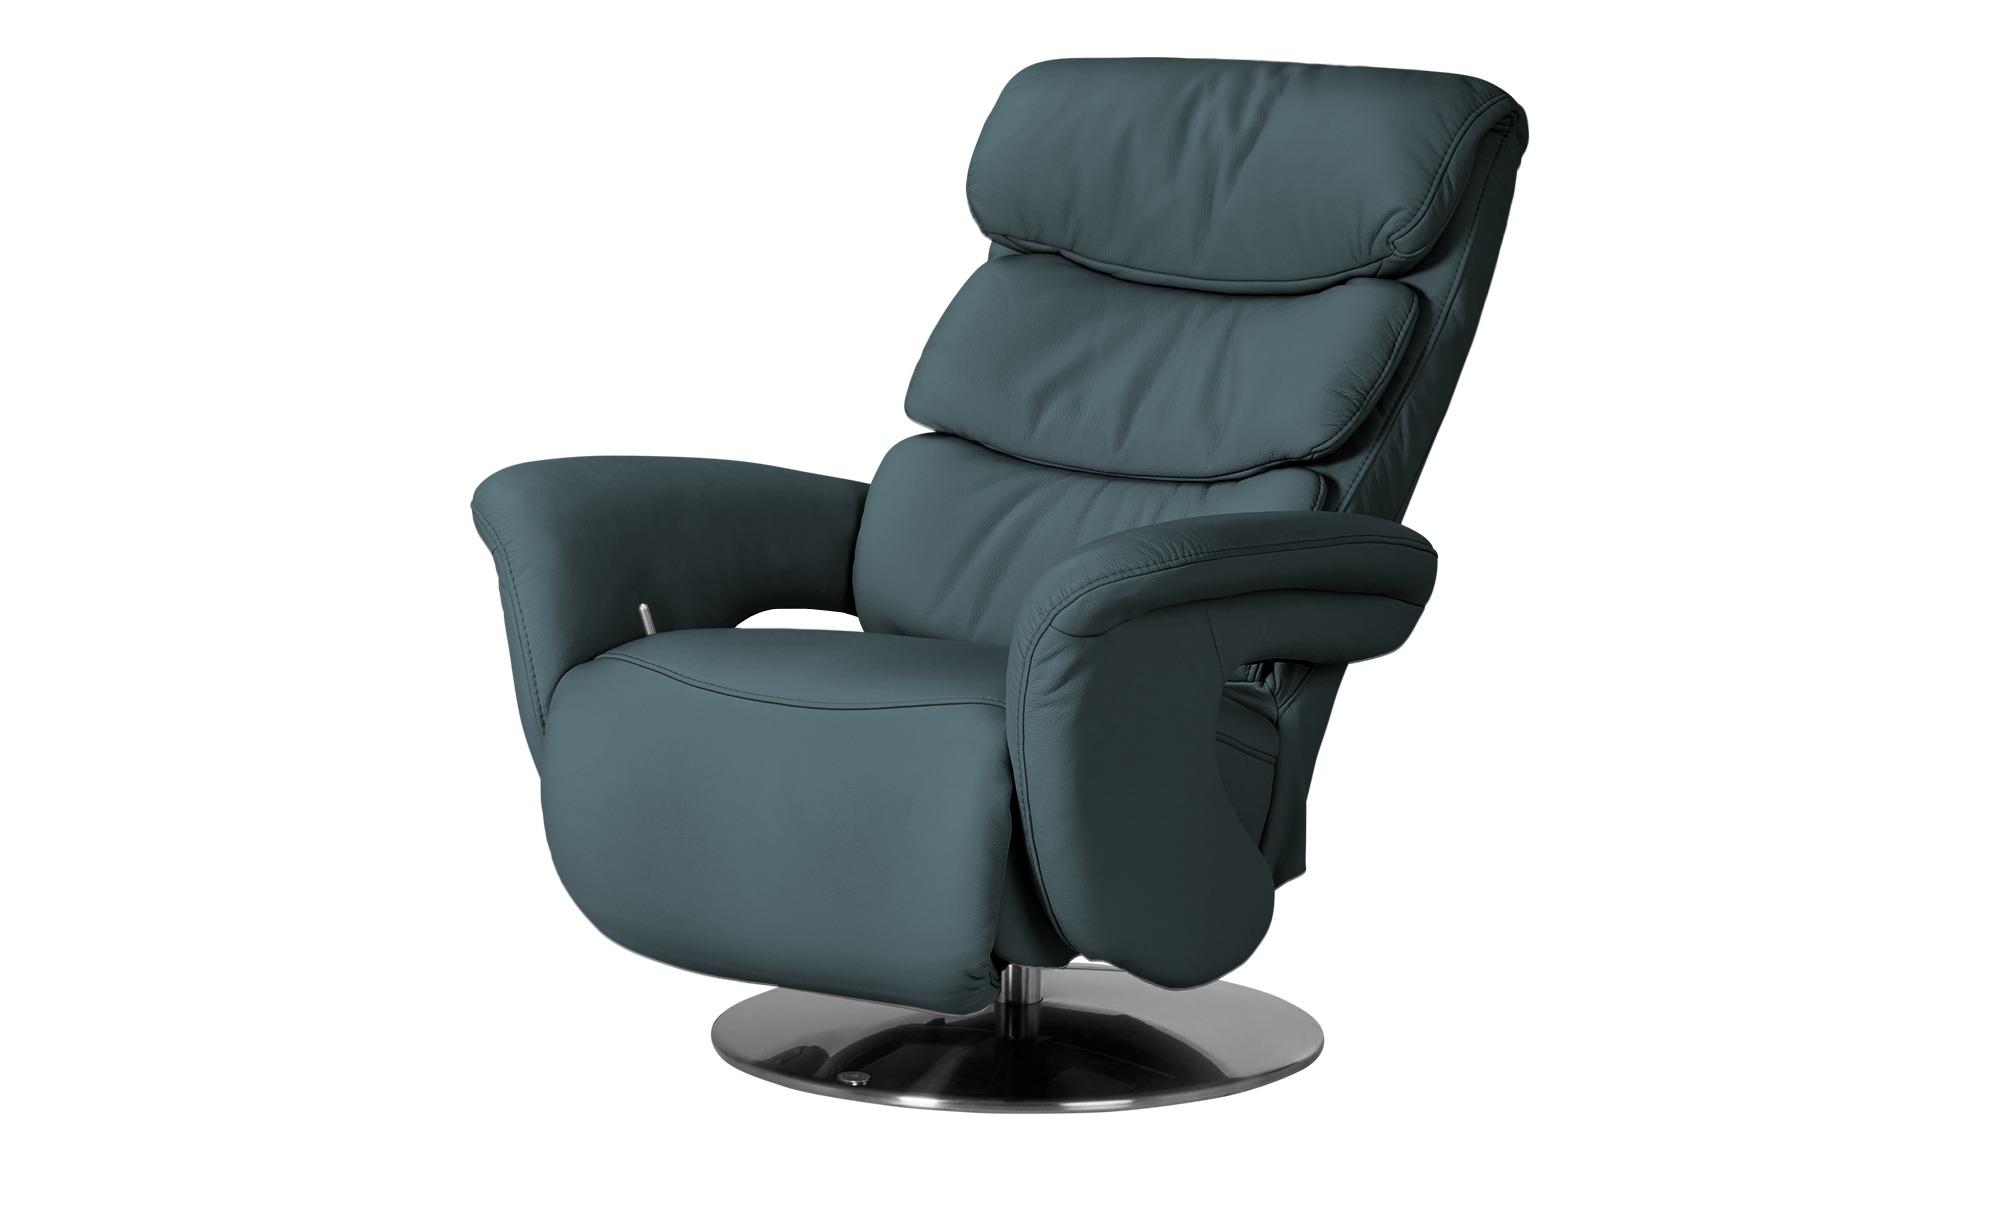 himolla Leder-Relaxsessel petrol 7228 ¦ türkis/petrol ¦ Maße (cm): B: 83 H: 109 T: 90 Polstermöbel > Sessel > Fernsehsessel - Höffner